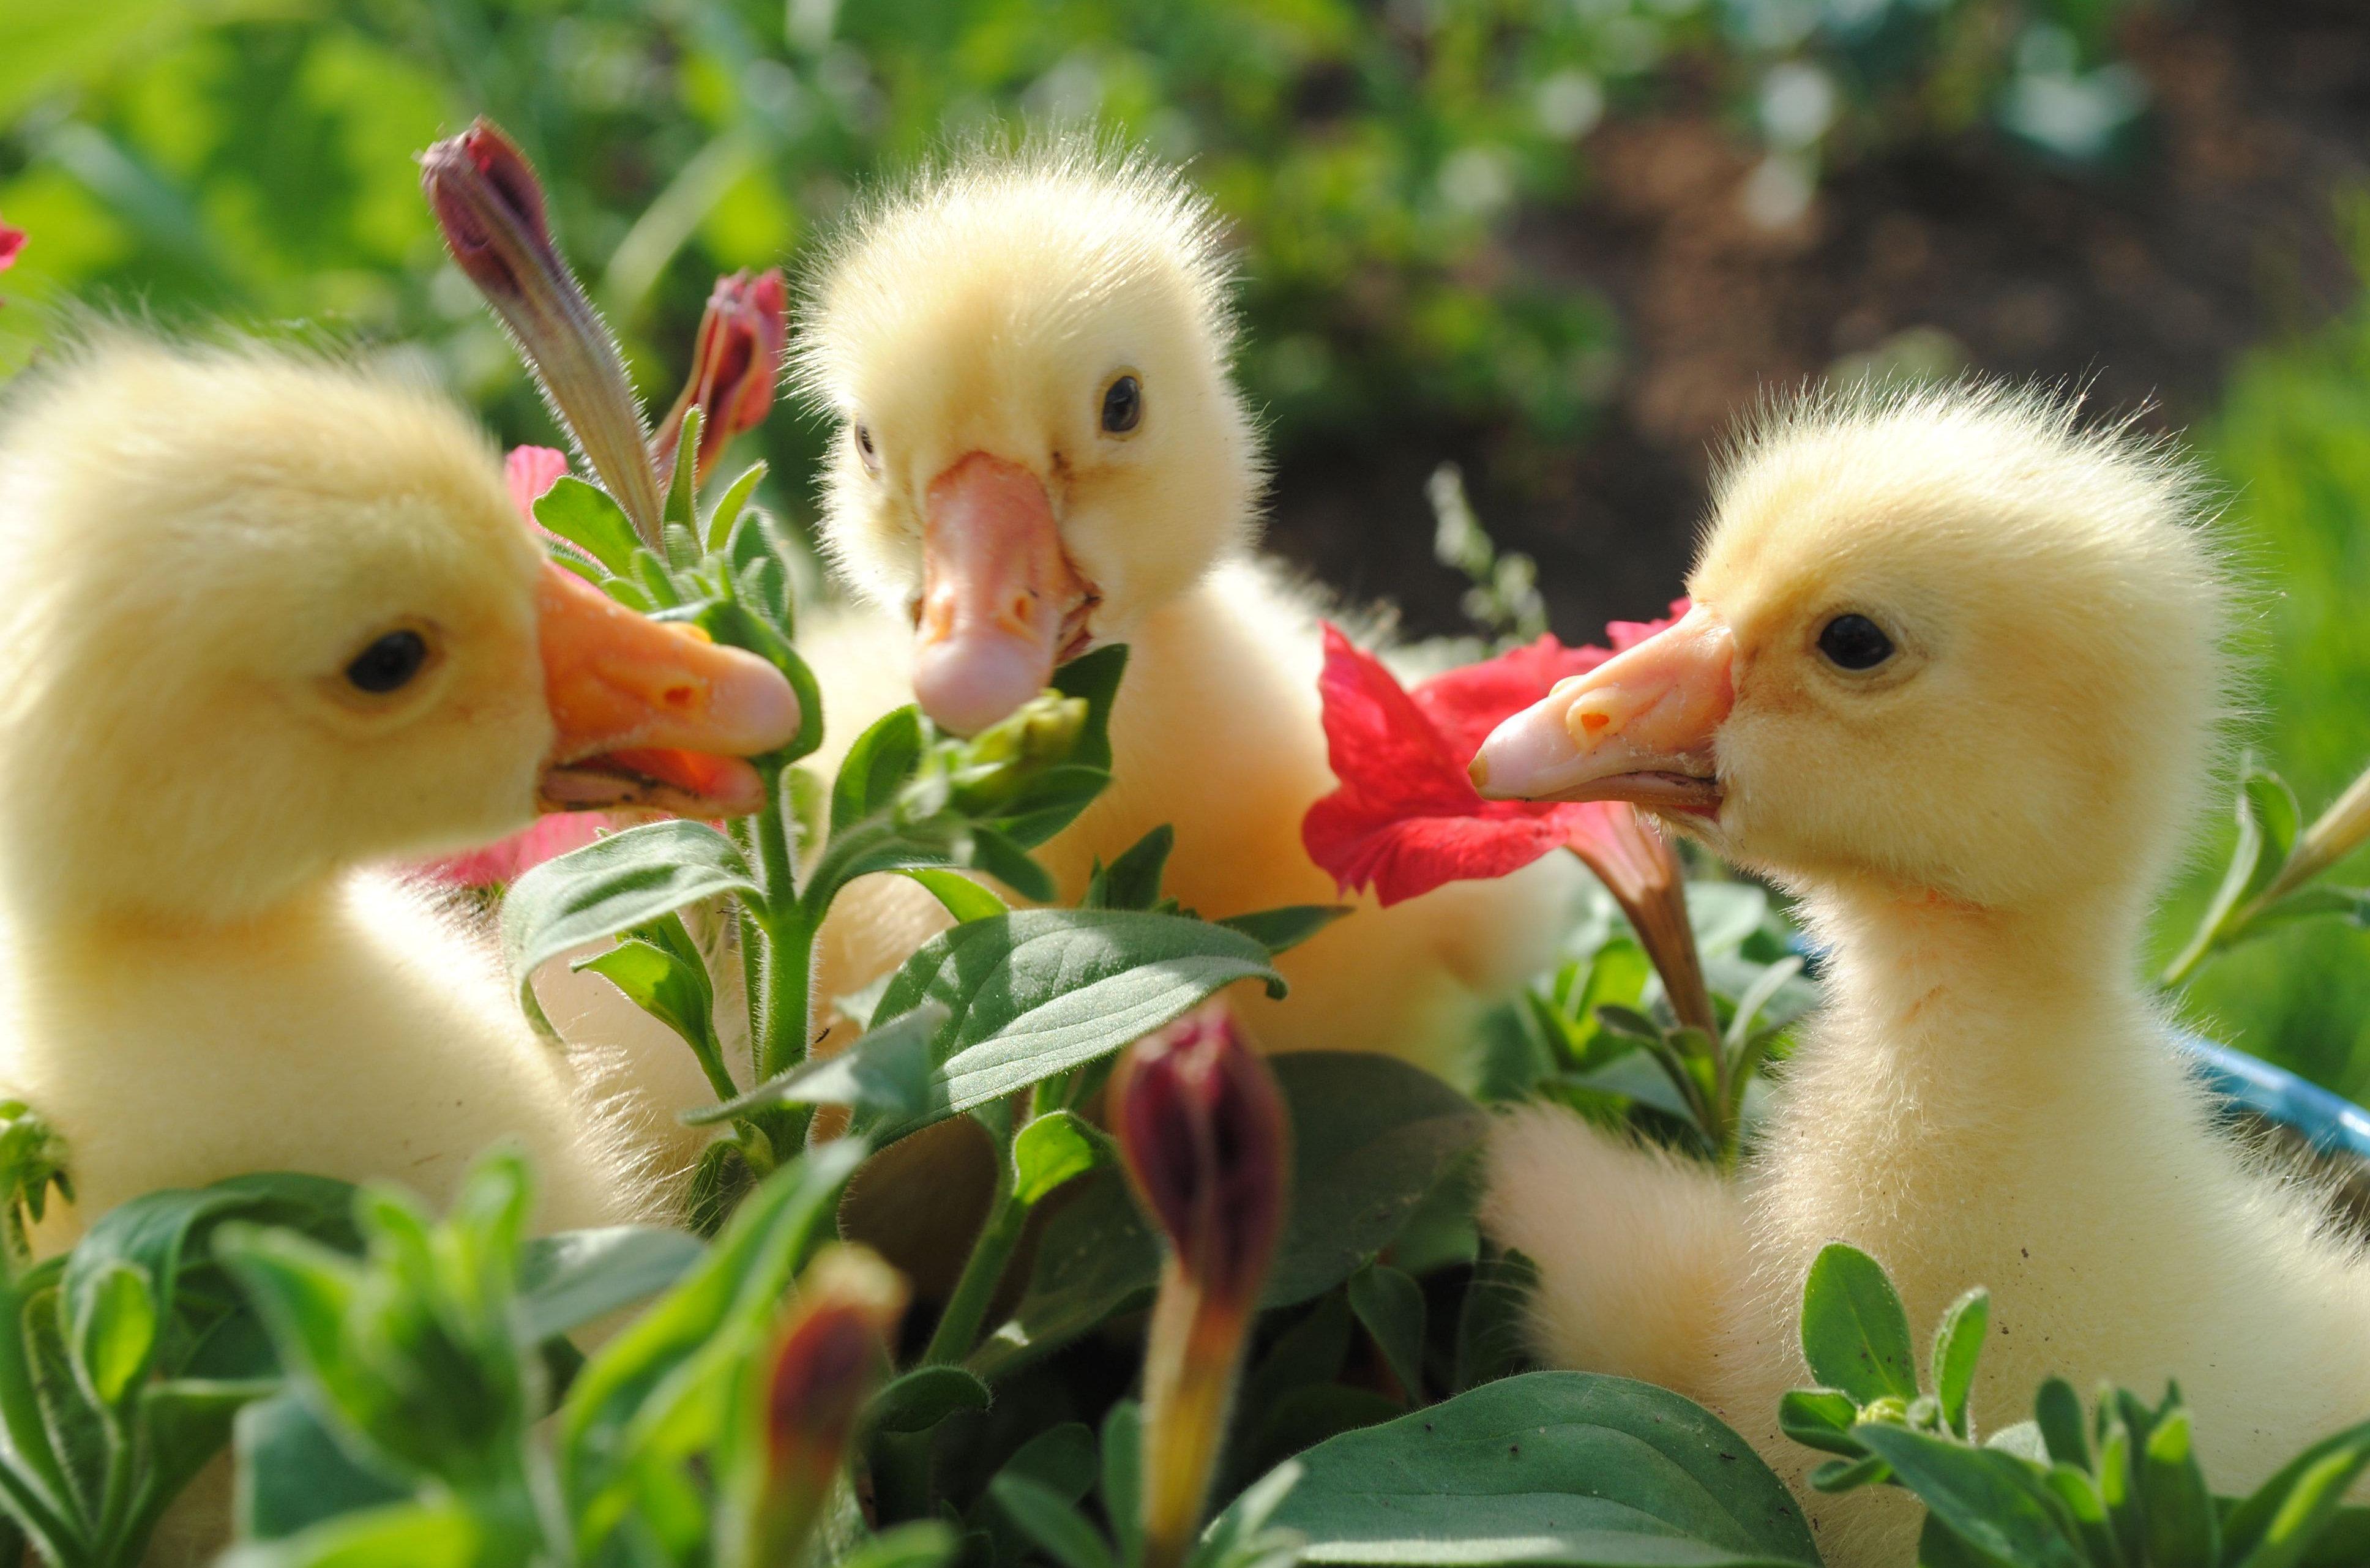 Animal - Duck - Ducks Wallpaper